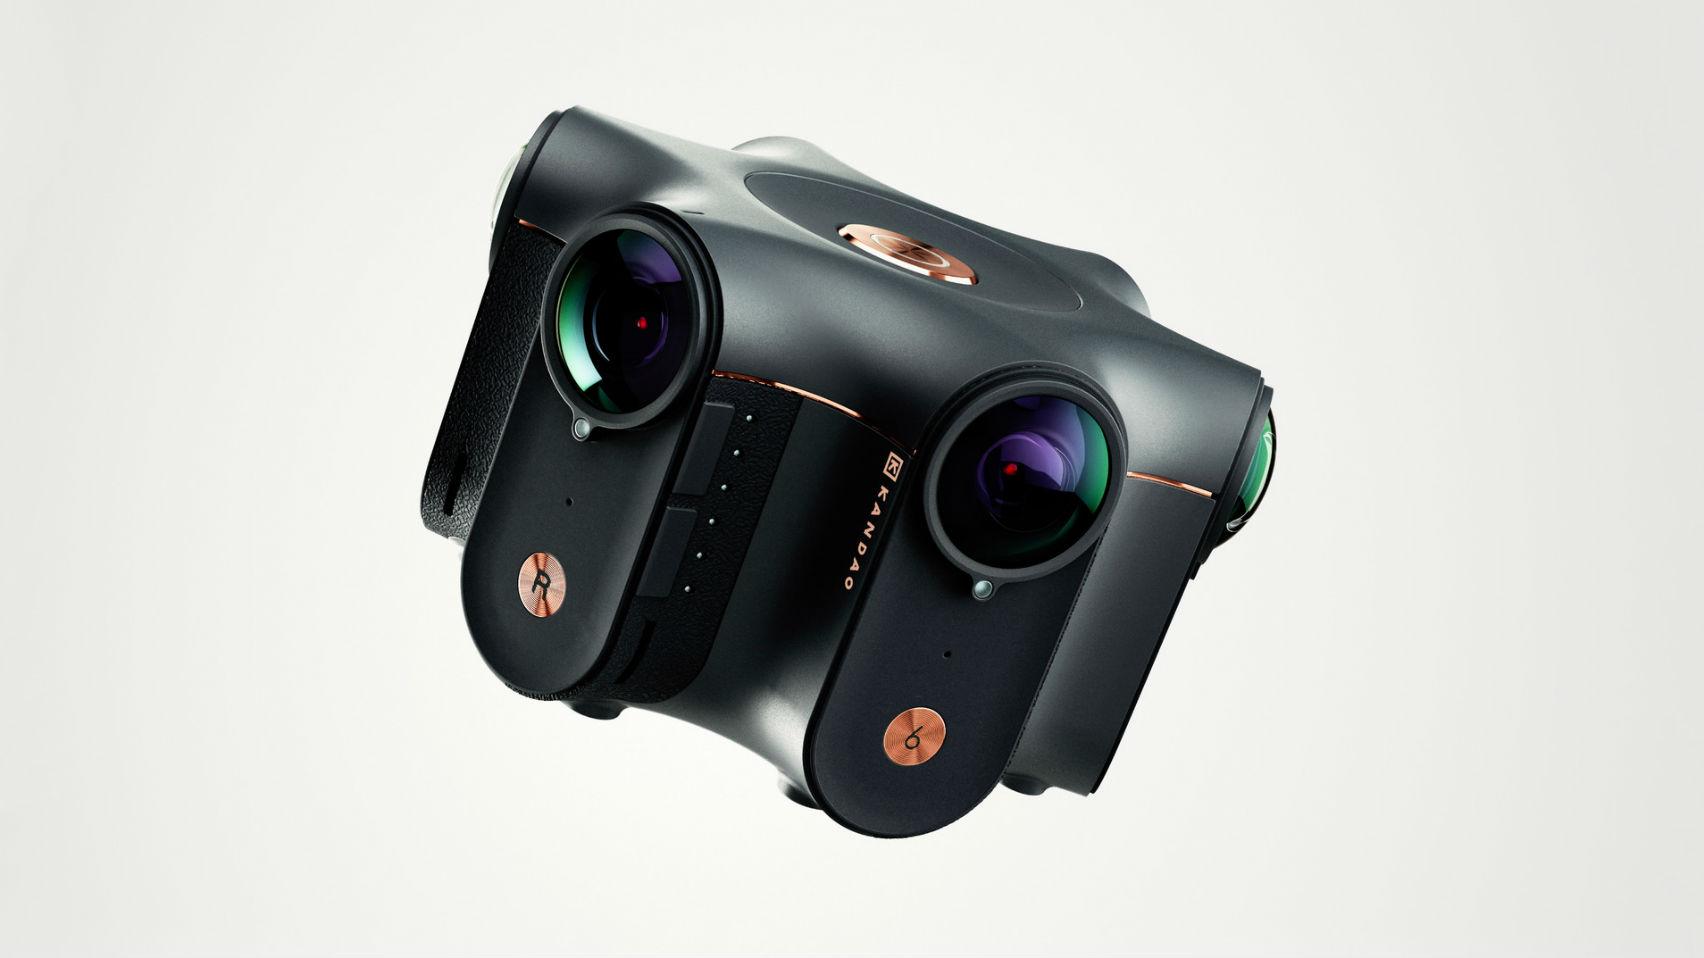 Kandao Obsidian 3D 360-degree VR Camera, by JU&KE creative design